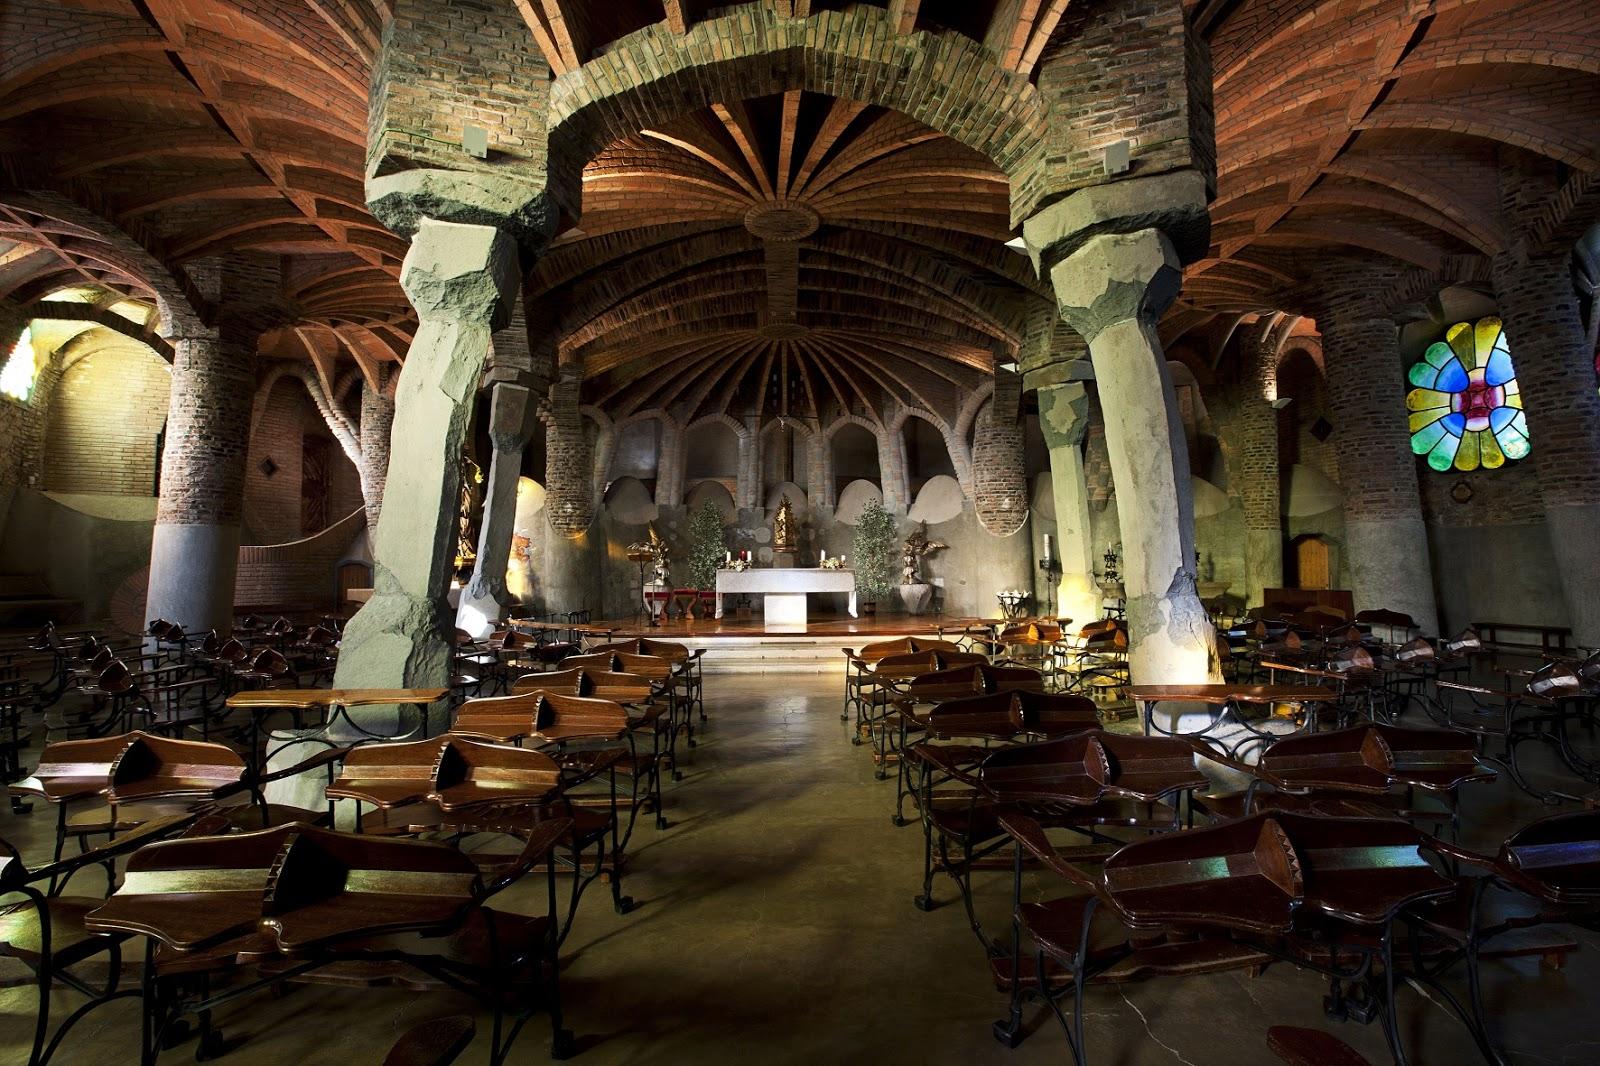 Güell Colony, Place of interest, Barcelona, Spain: All year